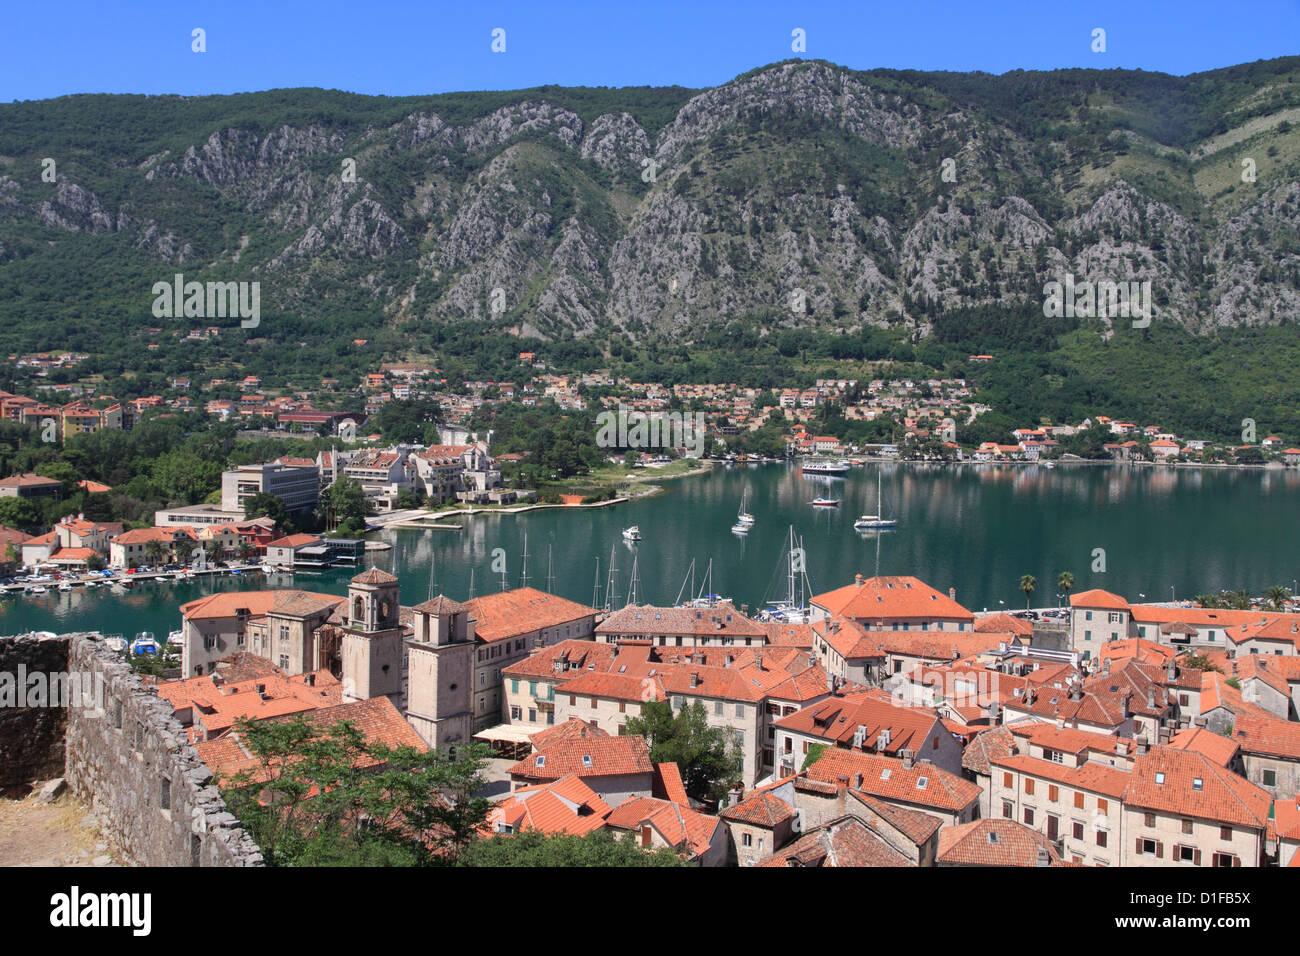 Kotor old town, UNESCO World Heritage Site, Montenegro, Europe - Stock Image